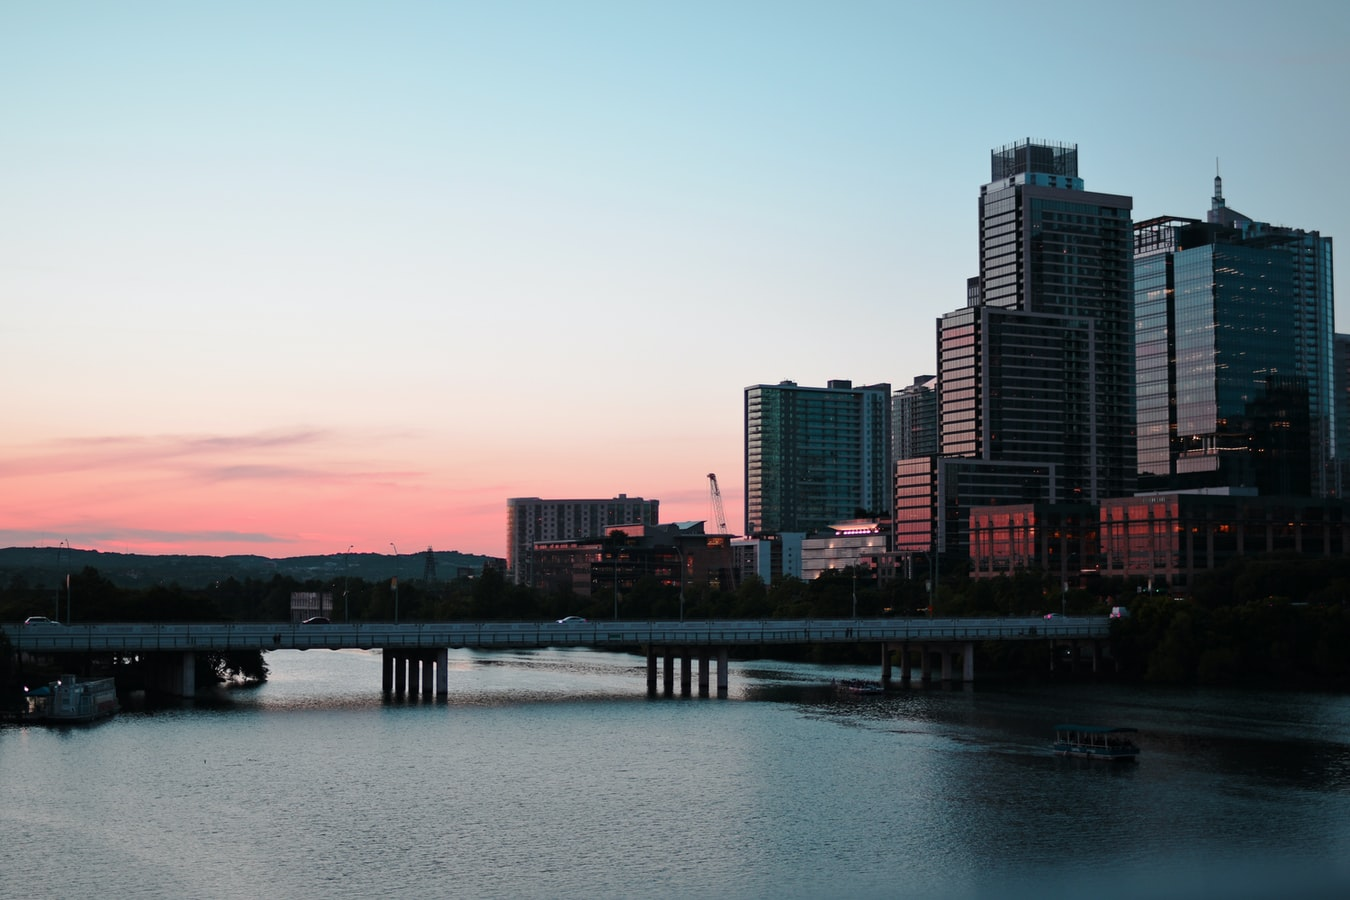 An Austin, Texas bridge at sunset.